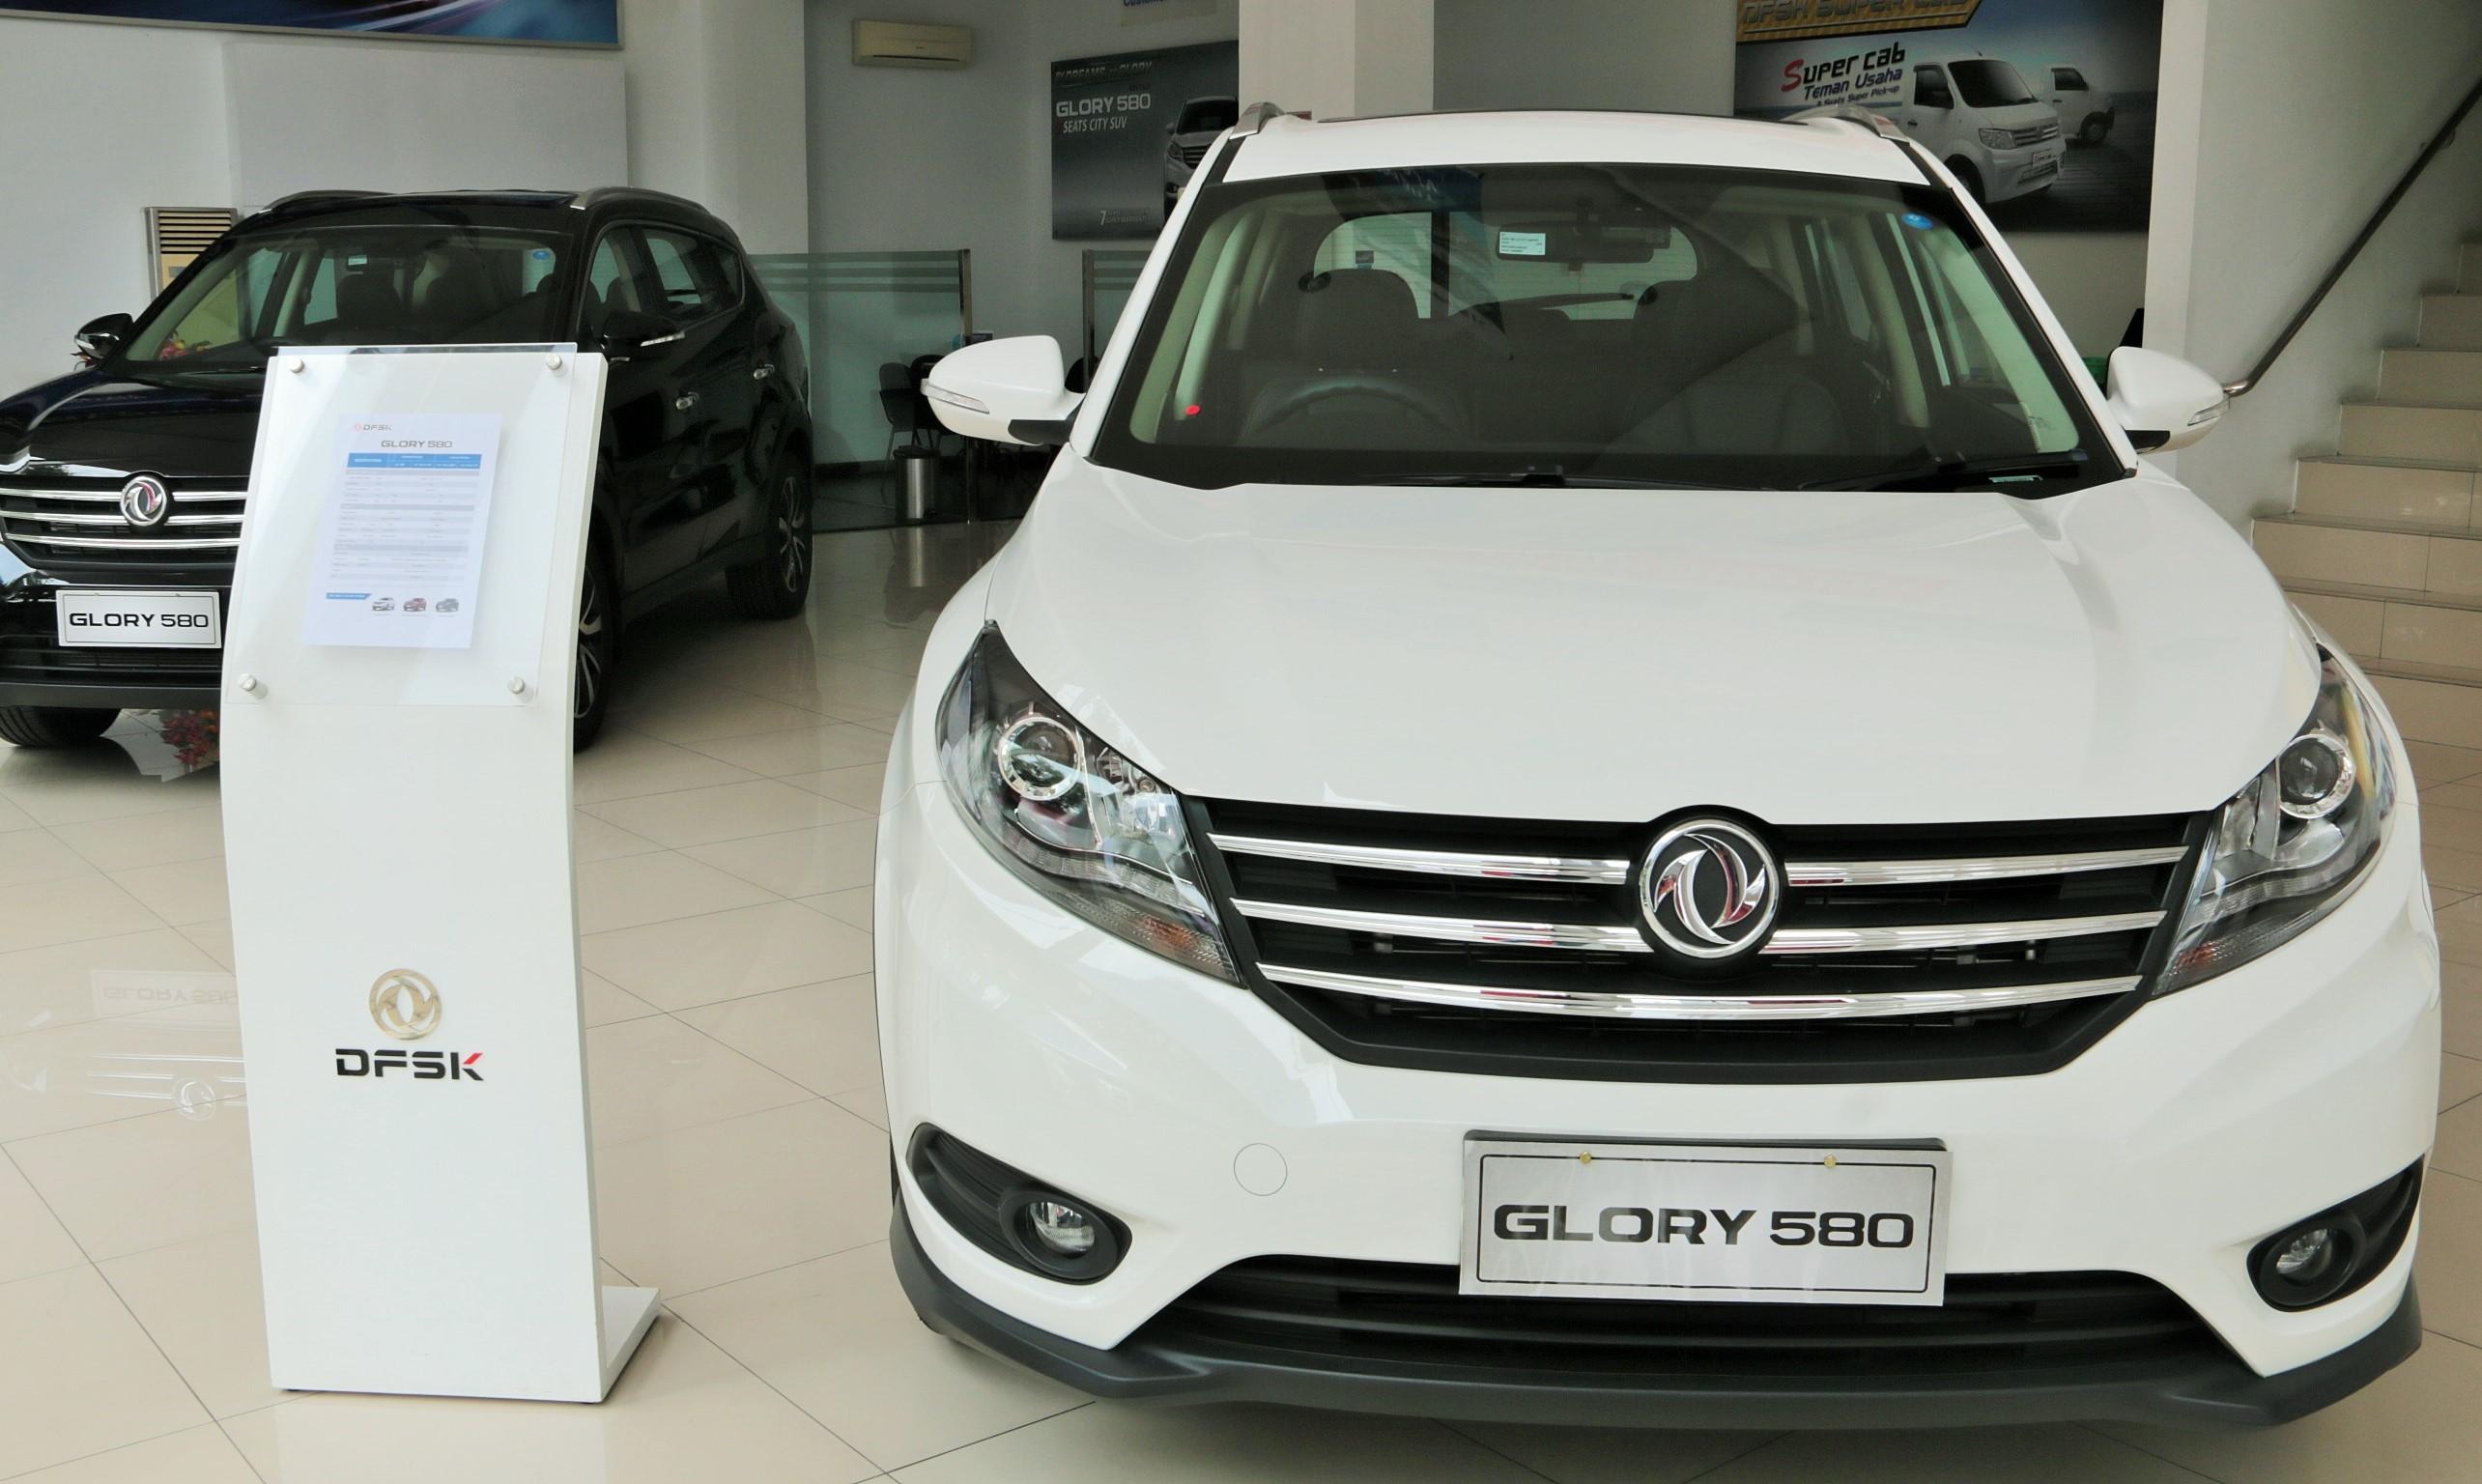 DFSK Glory 580 Tetap Tawarkan SUV Kurang Dari dari Rp250 Juta - [en]